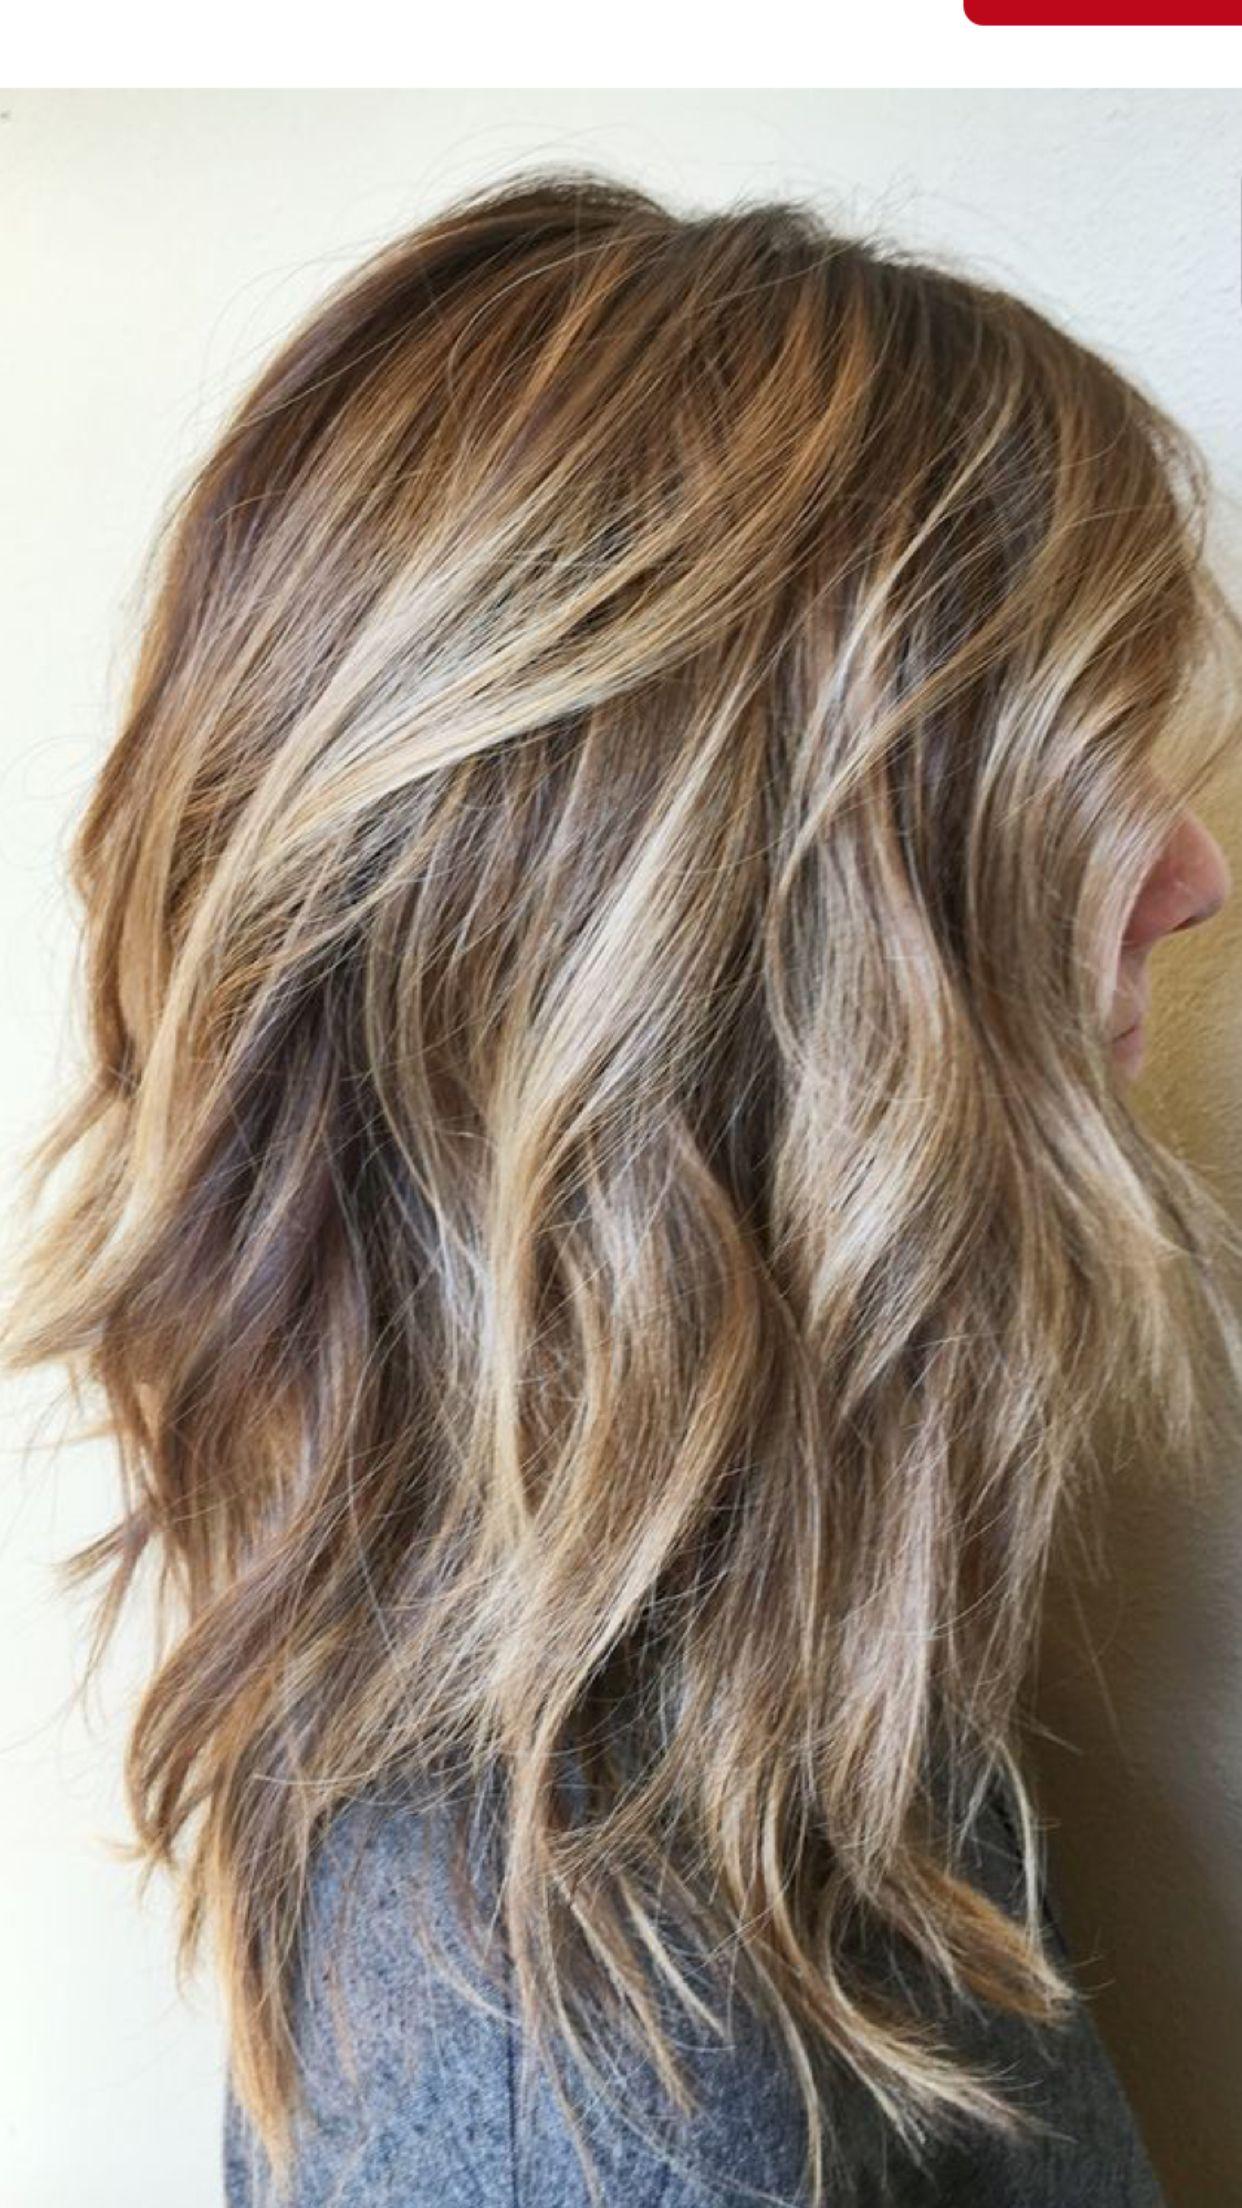 Pin by Nique Christensen on Hair Pinterest